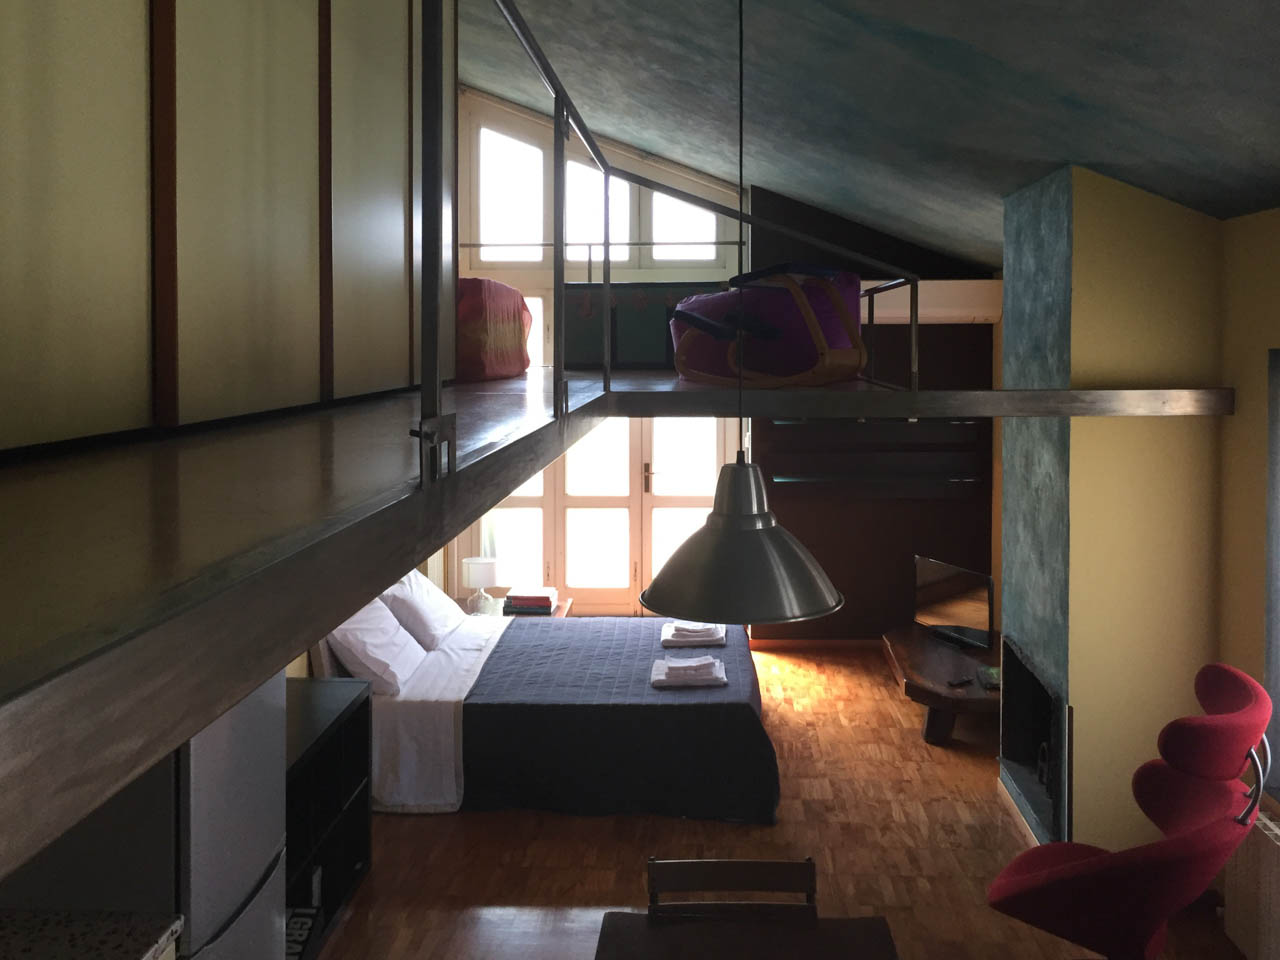 bed-and-breakfast-treviglio-camera-cielo-0010